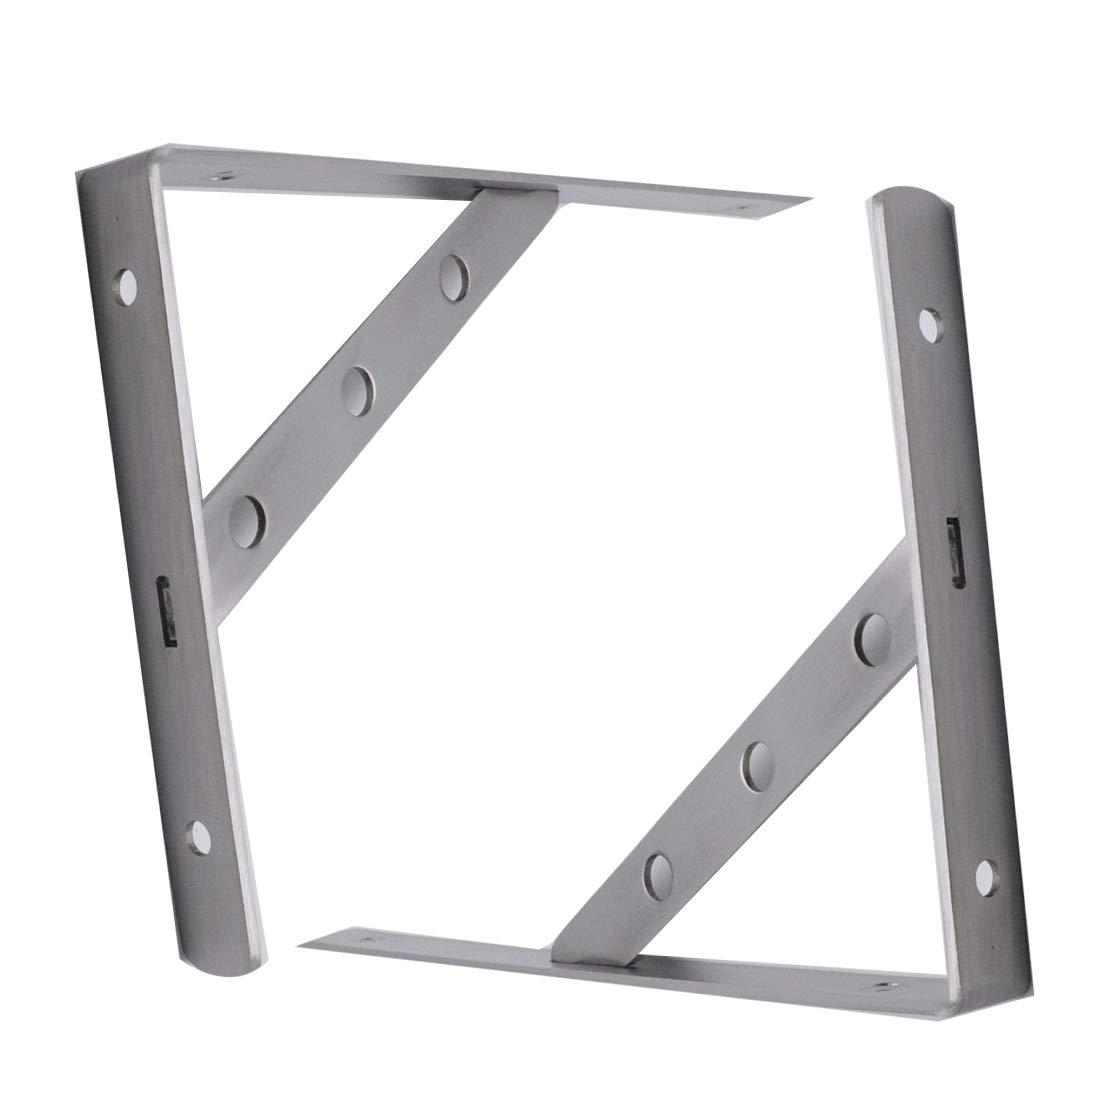 ZXHAO 10 inch Stainless Steel Triangle Heavy Duty Shelf Bracket Support Wall Hanging 2pcs